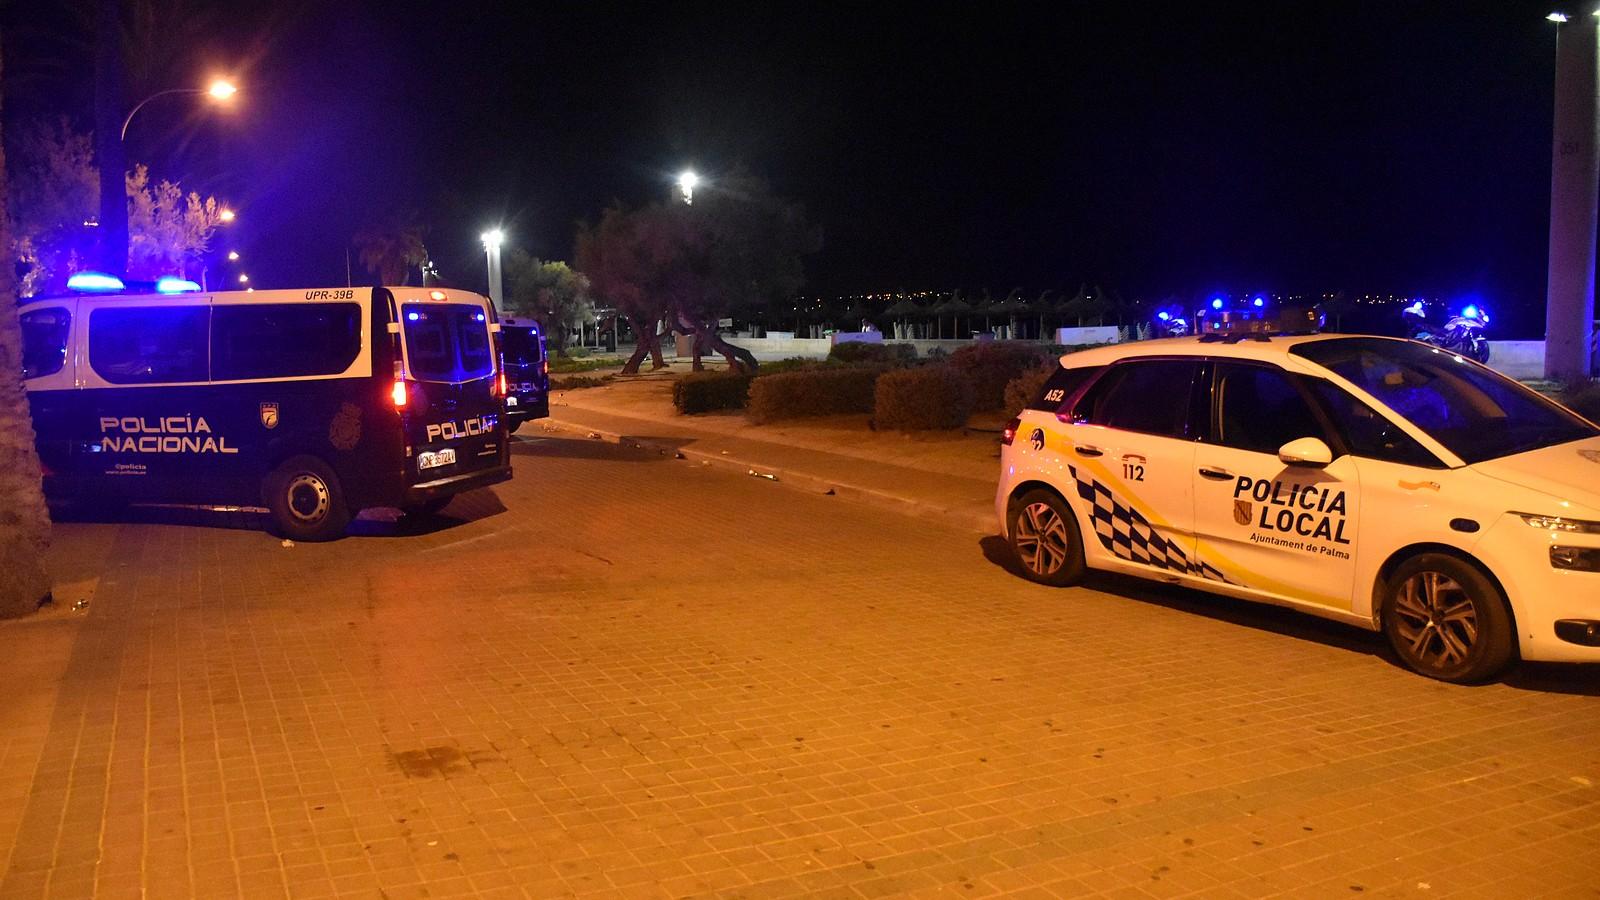 Polizei an der Playa de Palma auf Mallorca